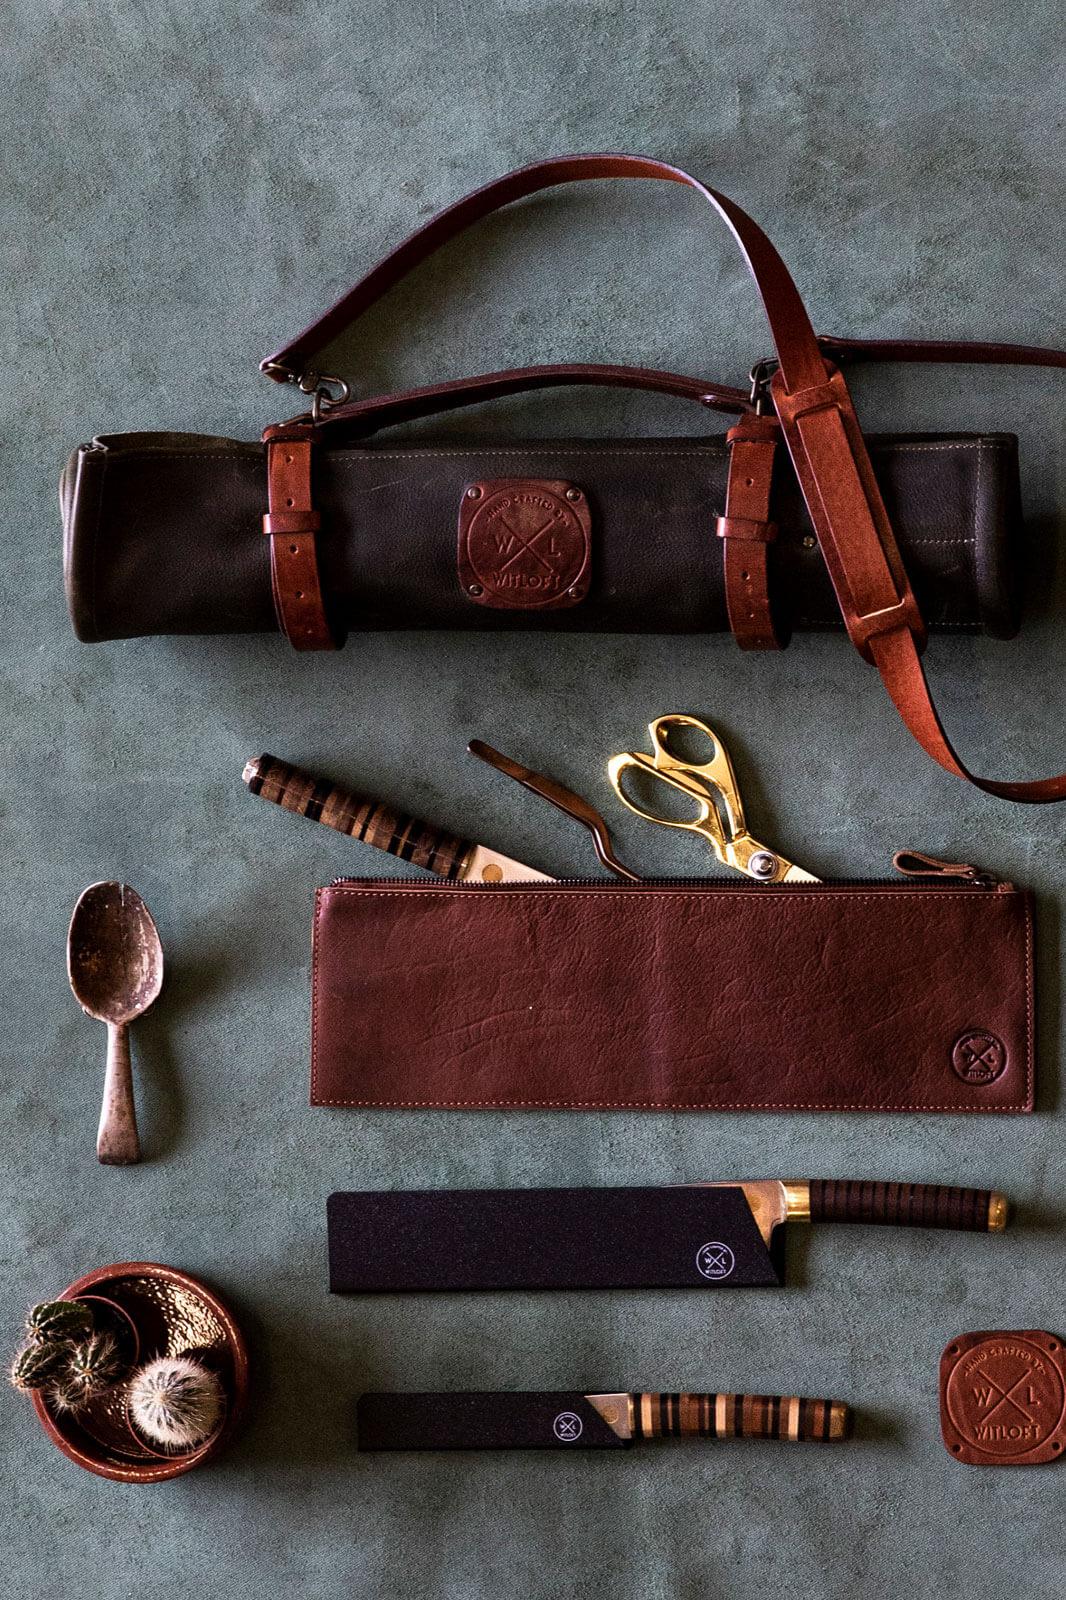 witloft kniferolls and pouches